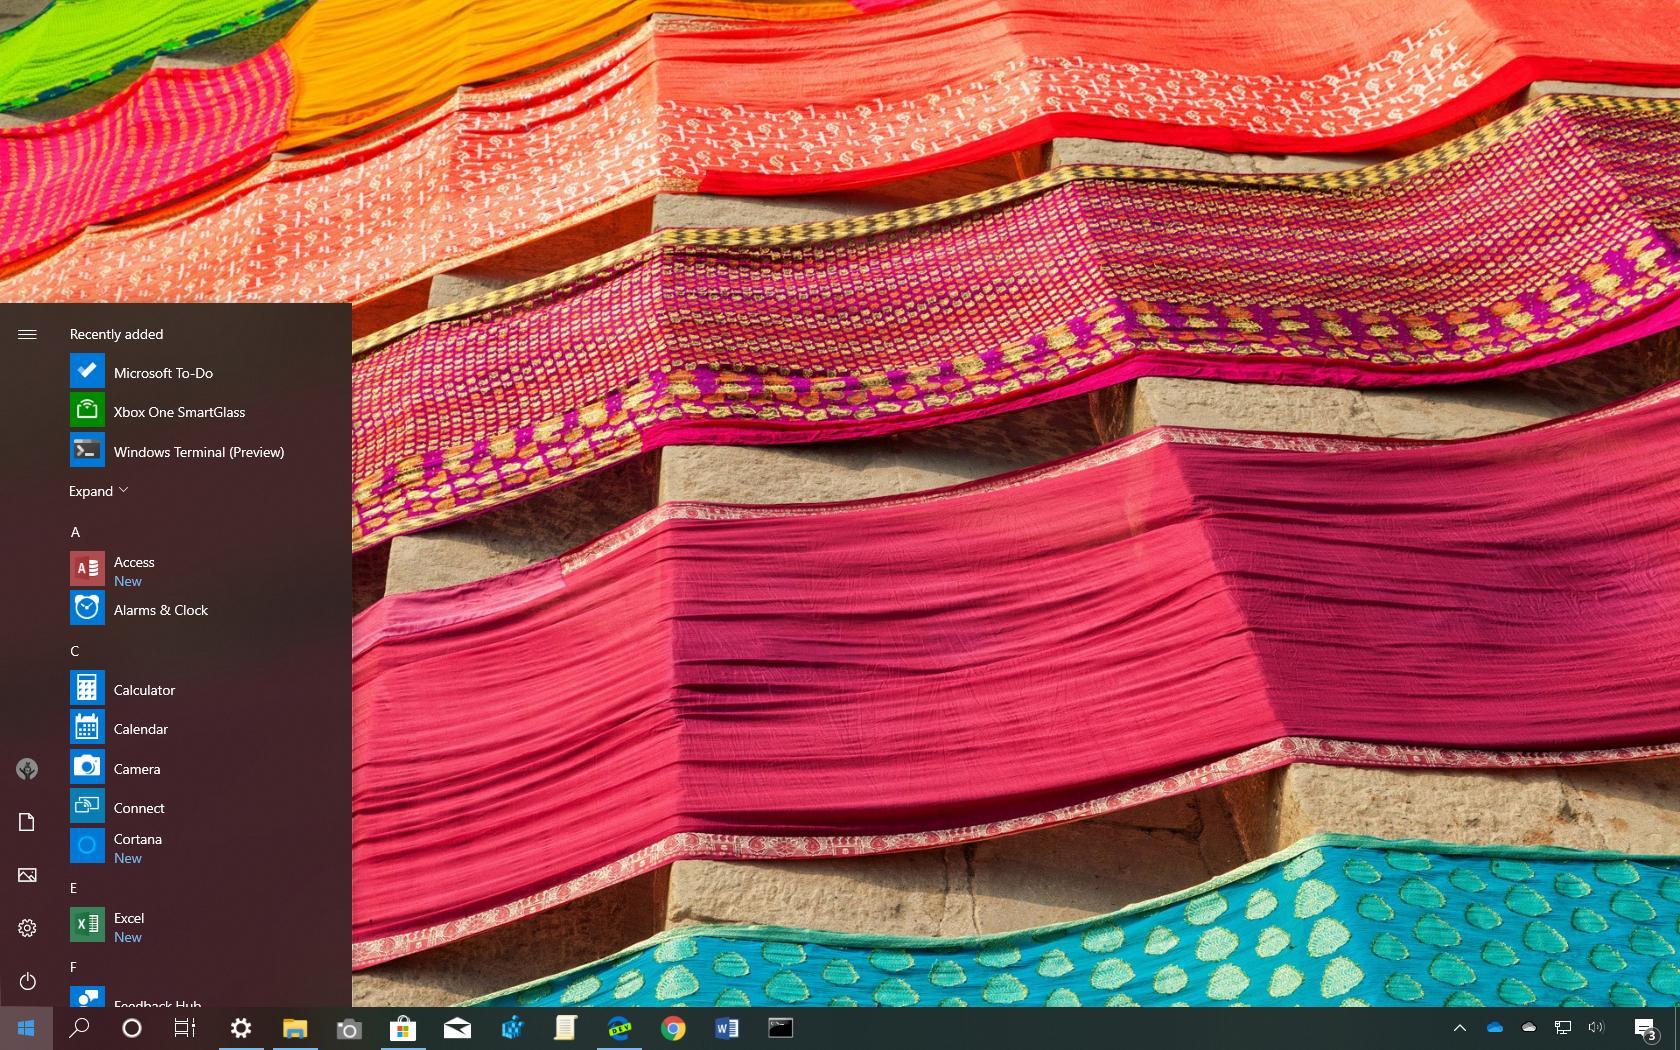 Fabrics of India theme for Windows 10